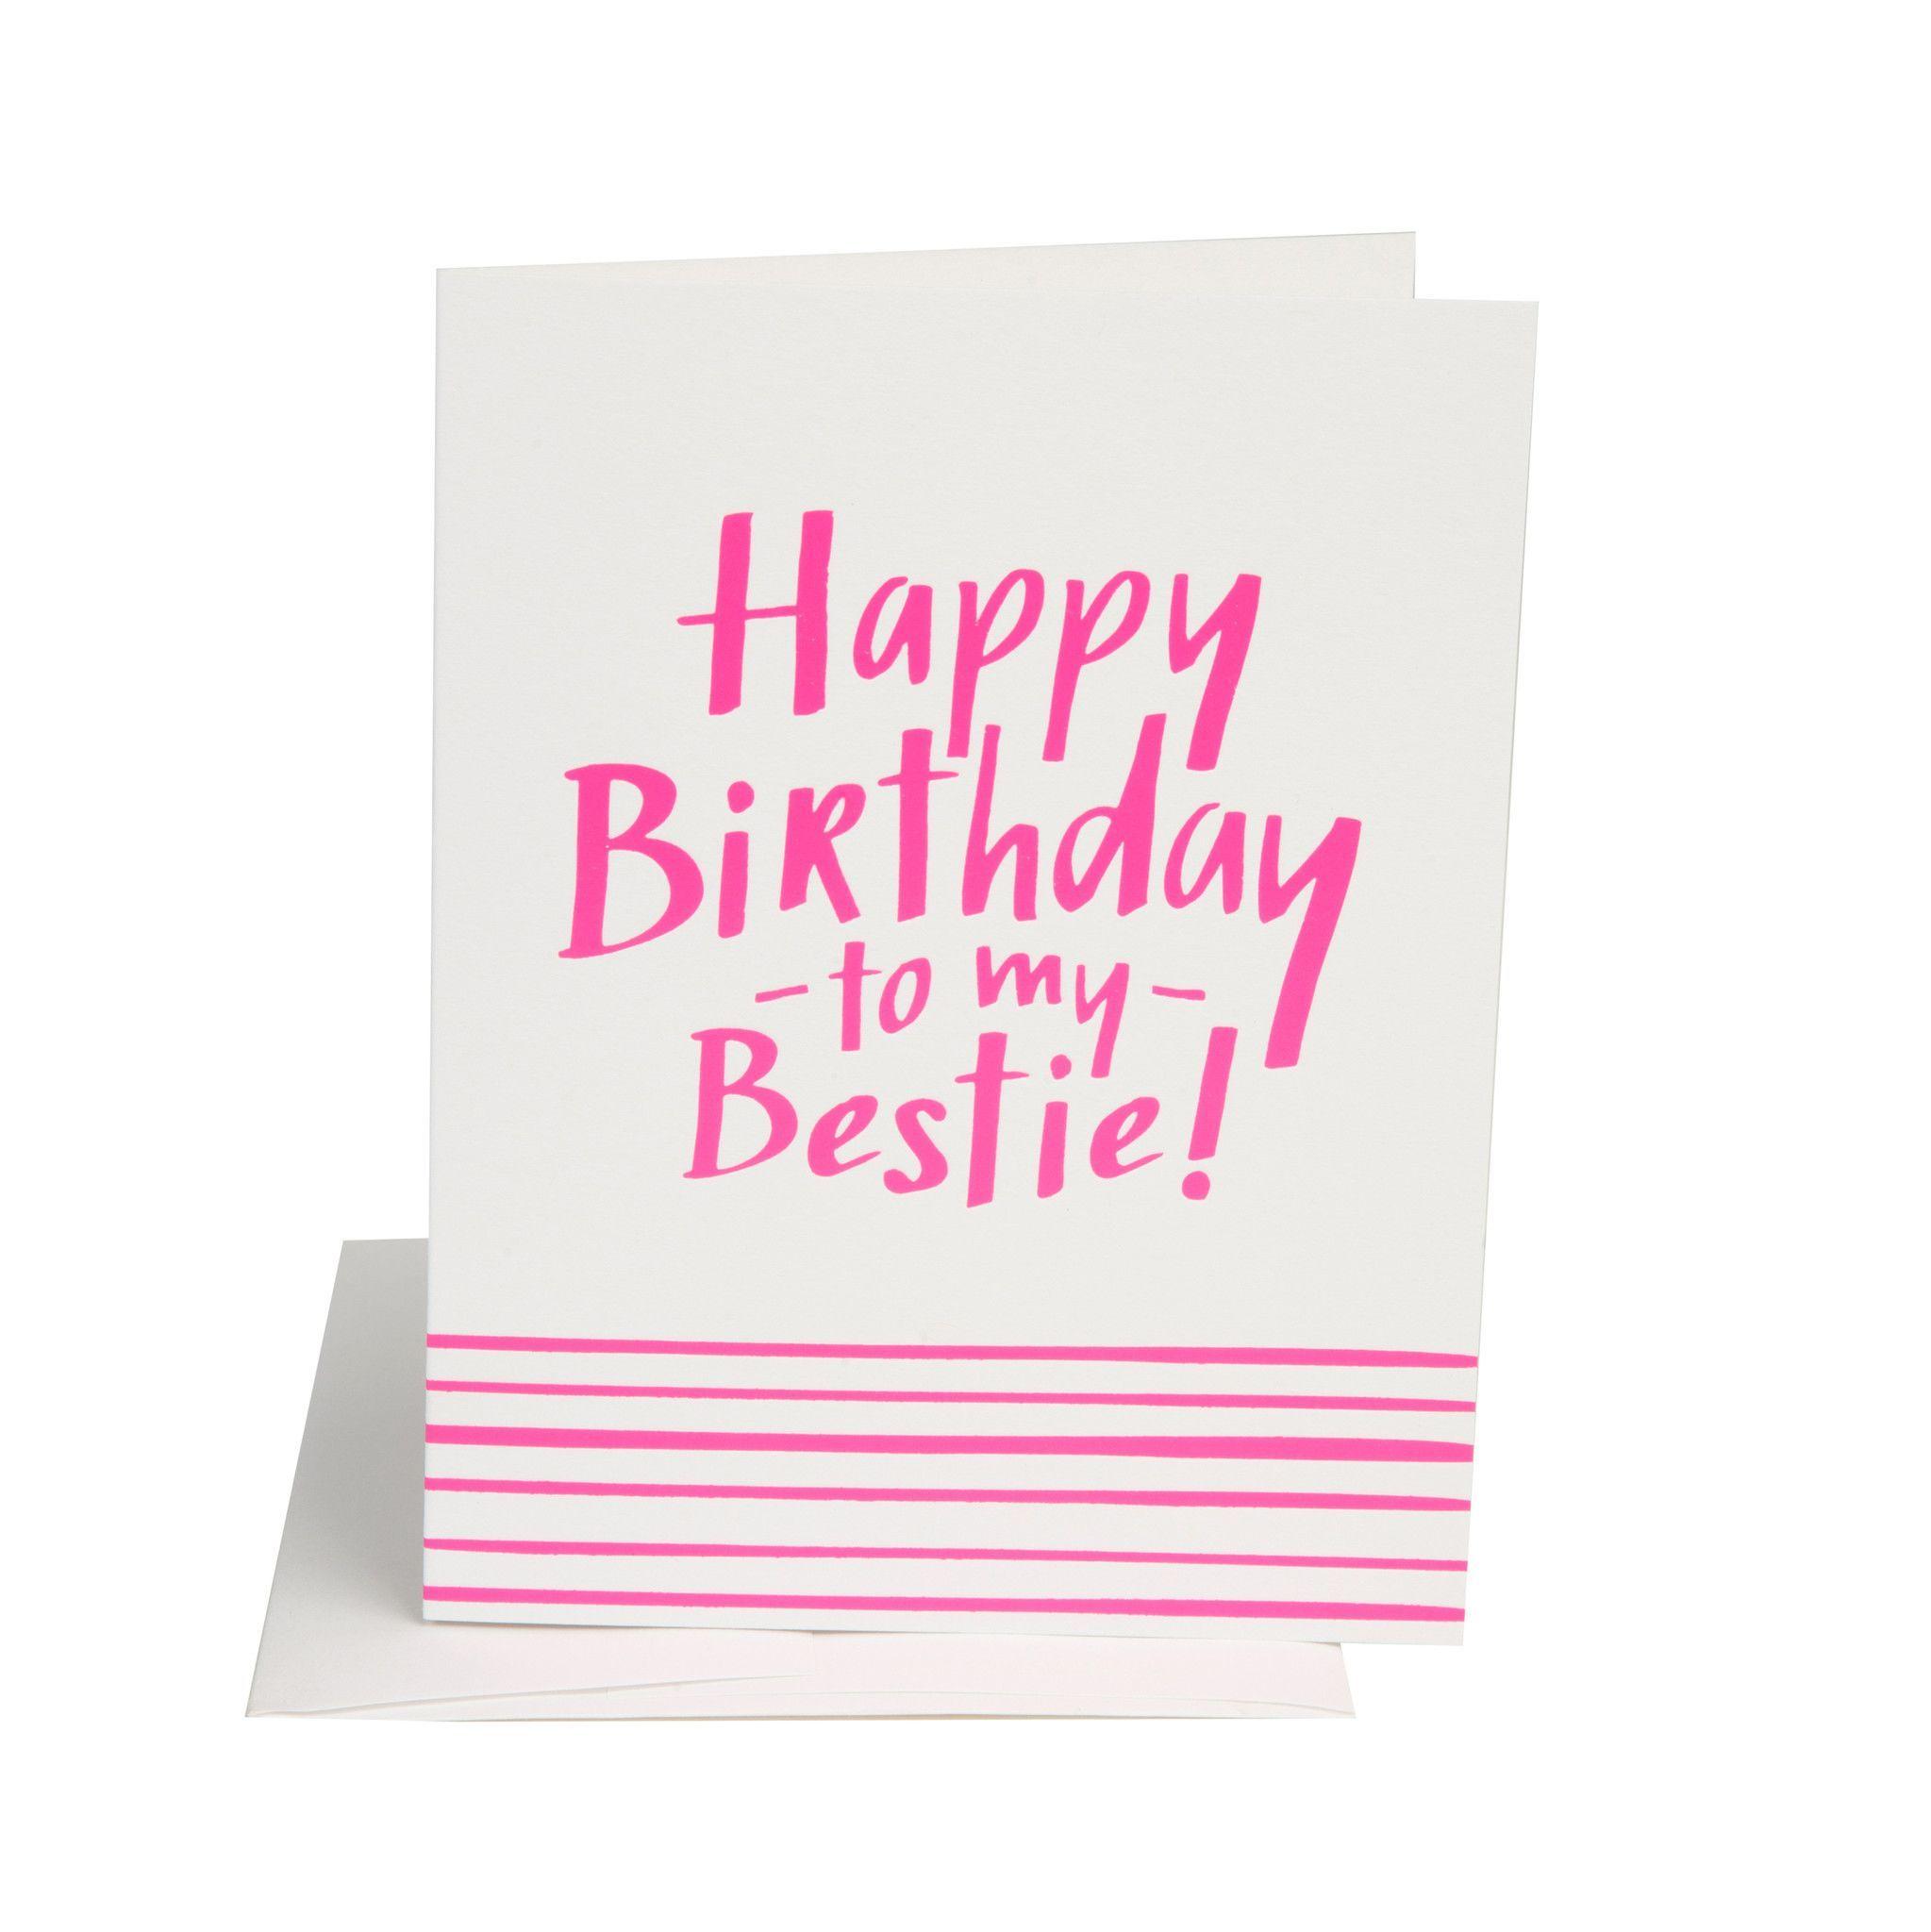 Best Friends Birthday Happy Birthday Best Friend Quotes Happy Birthday Quotes For Friends Friend Birthday Quotes